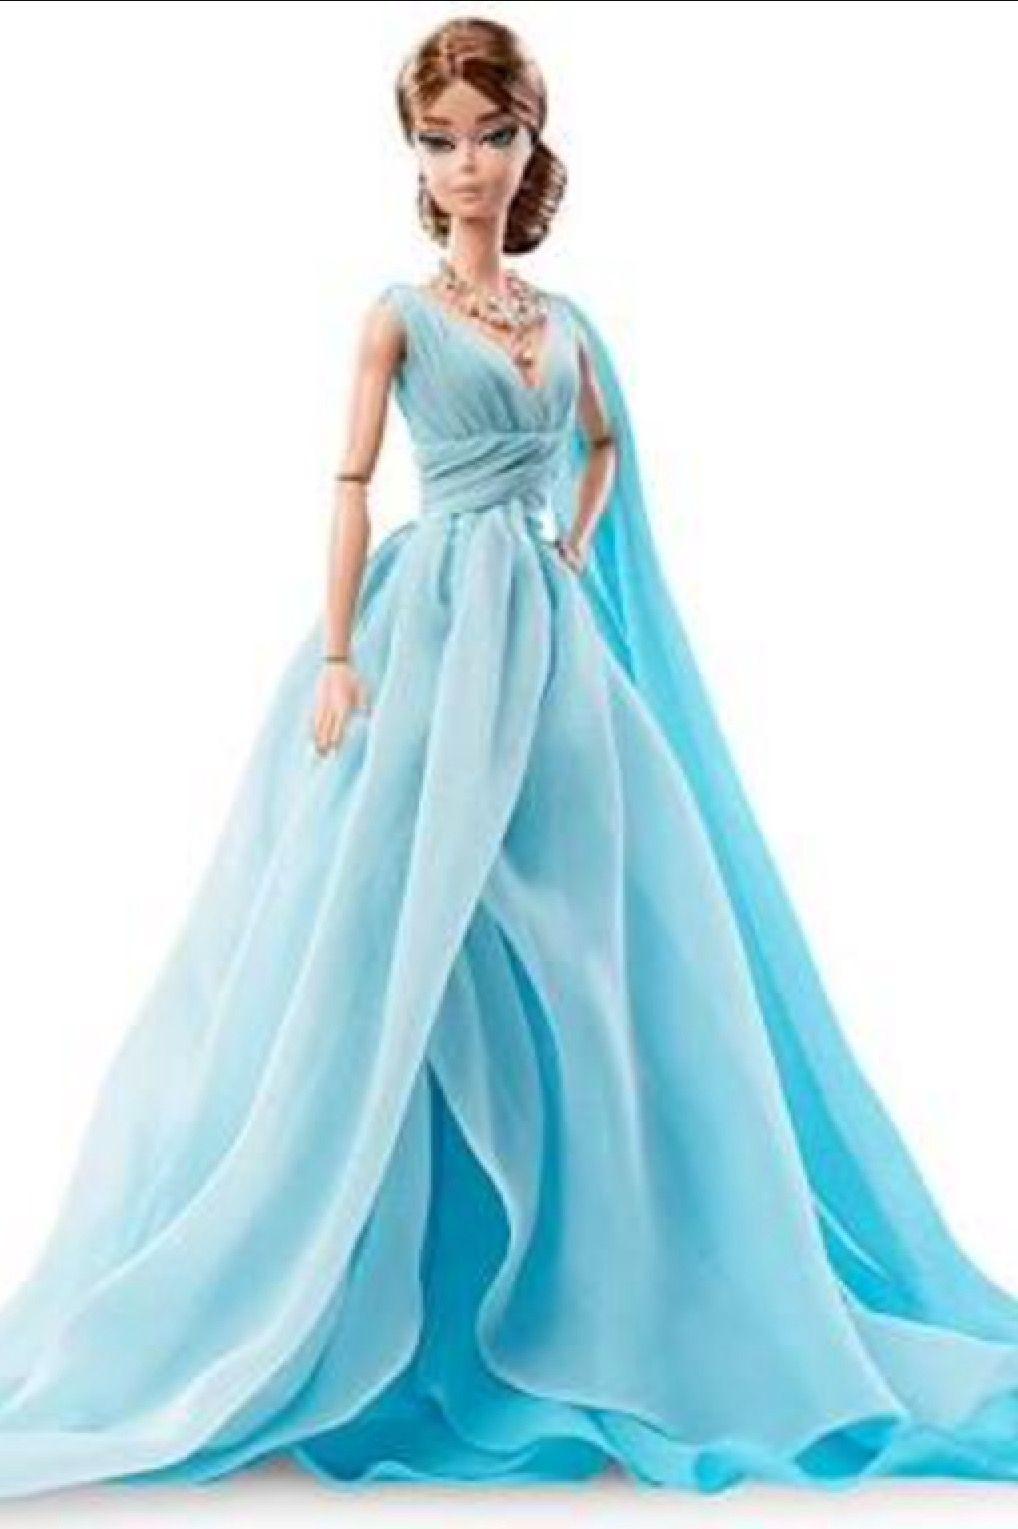 Vestido de FIESTA | Barbie | Pinterest | Barbie, Muñecas de moda y ...